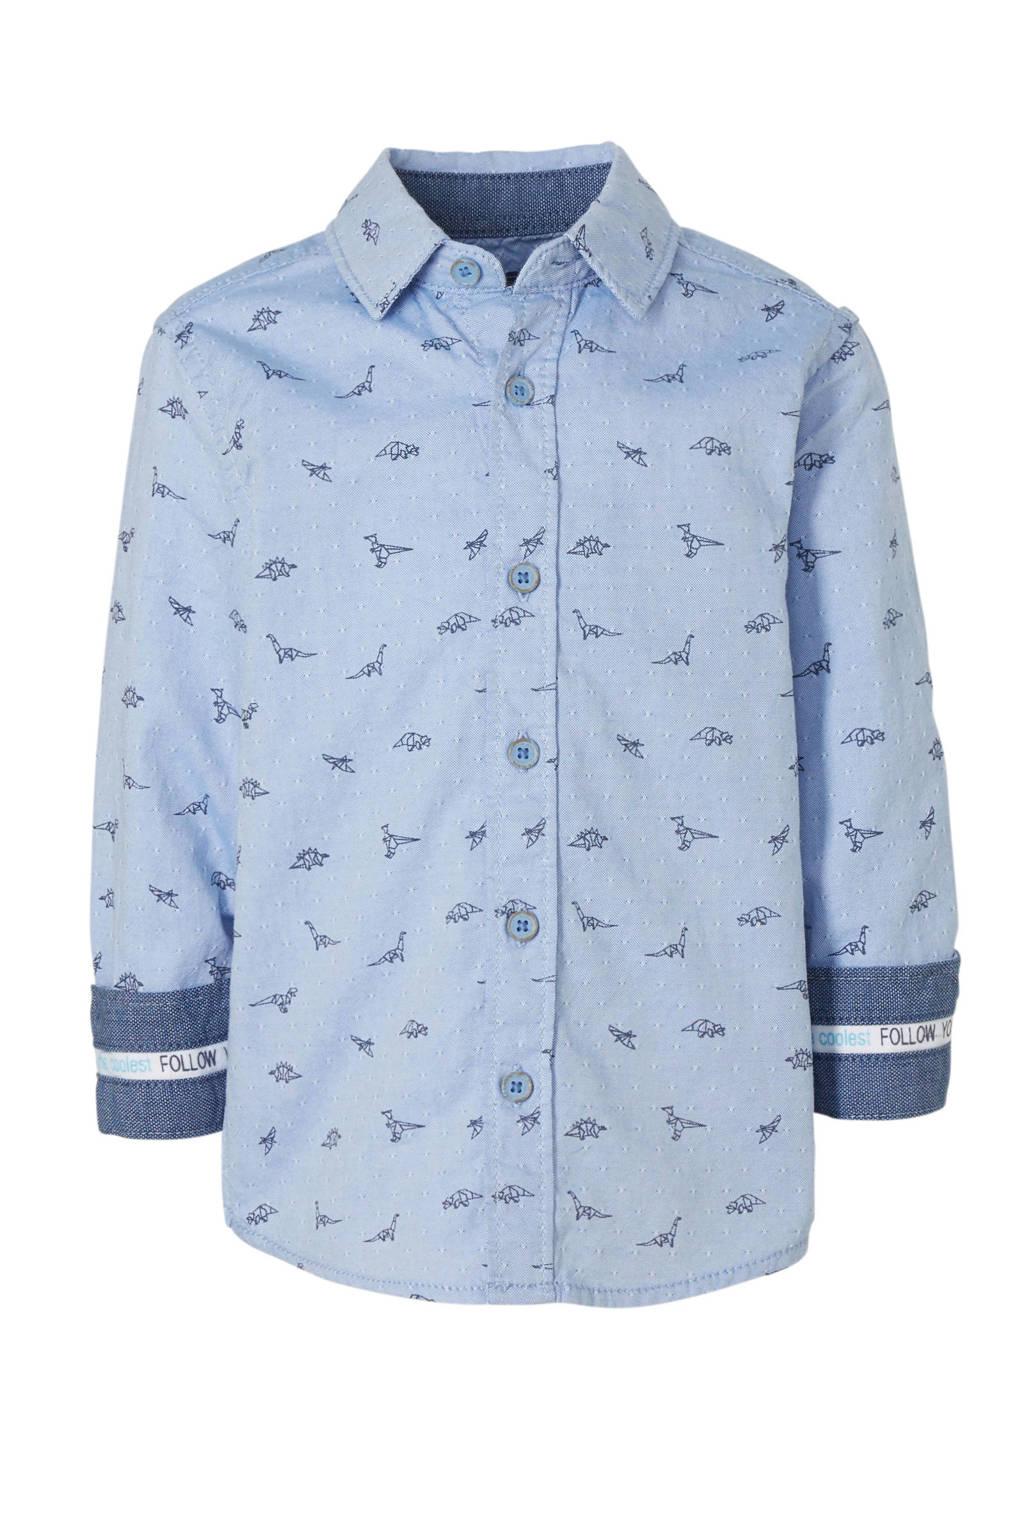 C&A Palomino overhemd met all over print blauw, Blauw